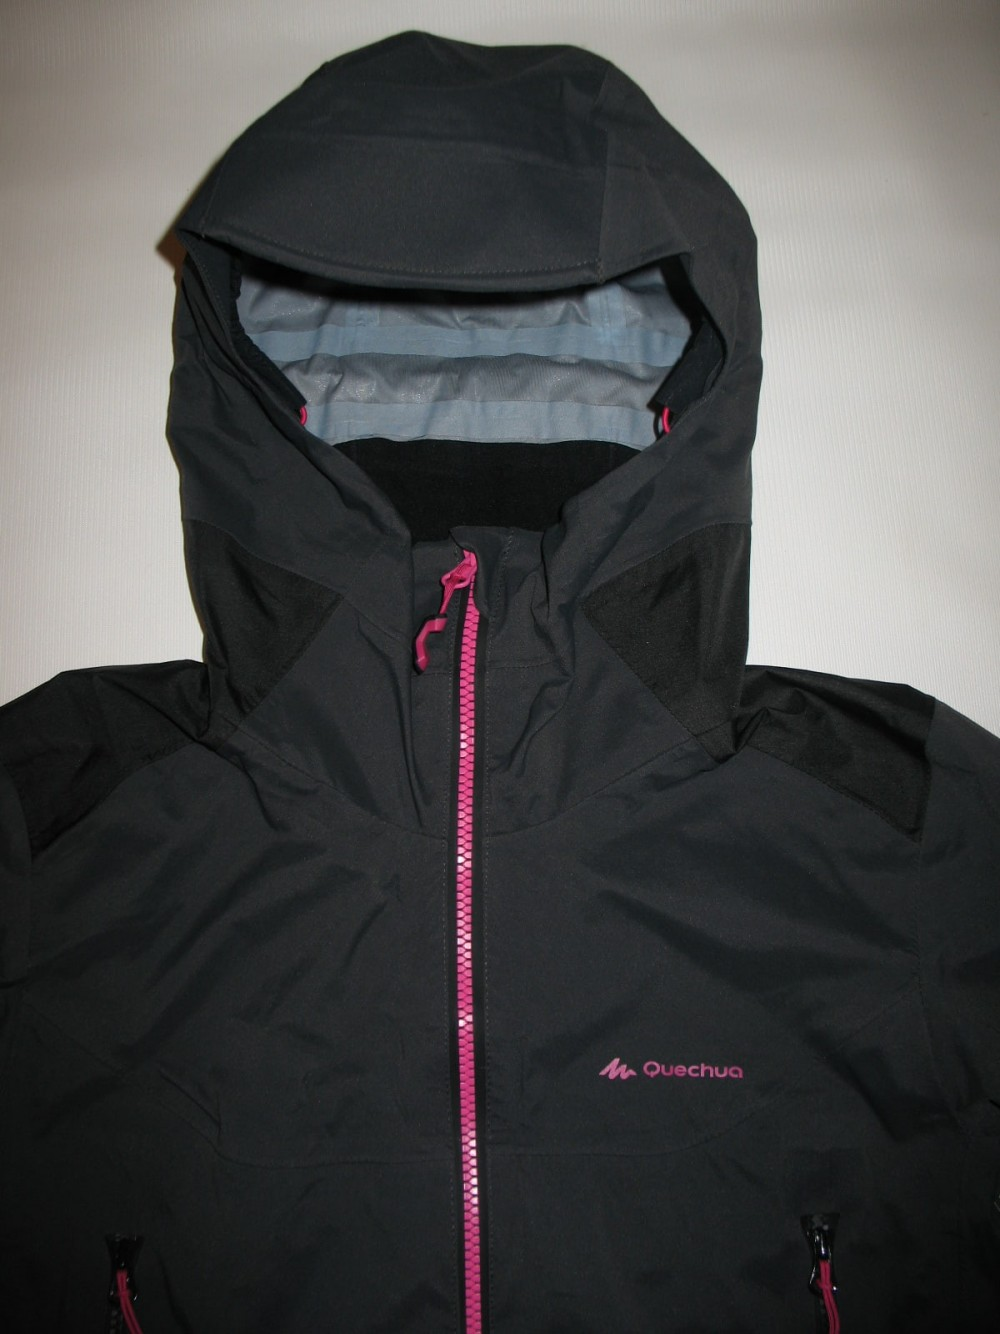 Куртка QUECHUA forclaz 900 l jacket lady (размер XS/S) - 7